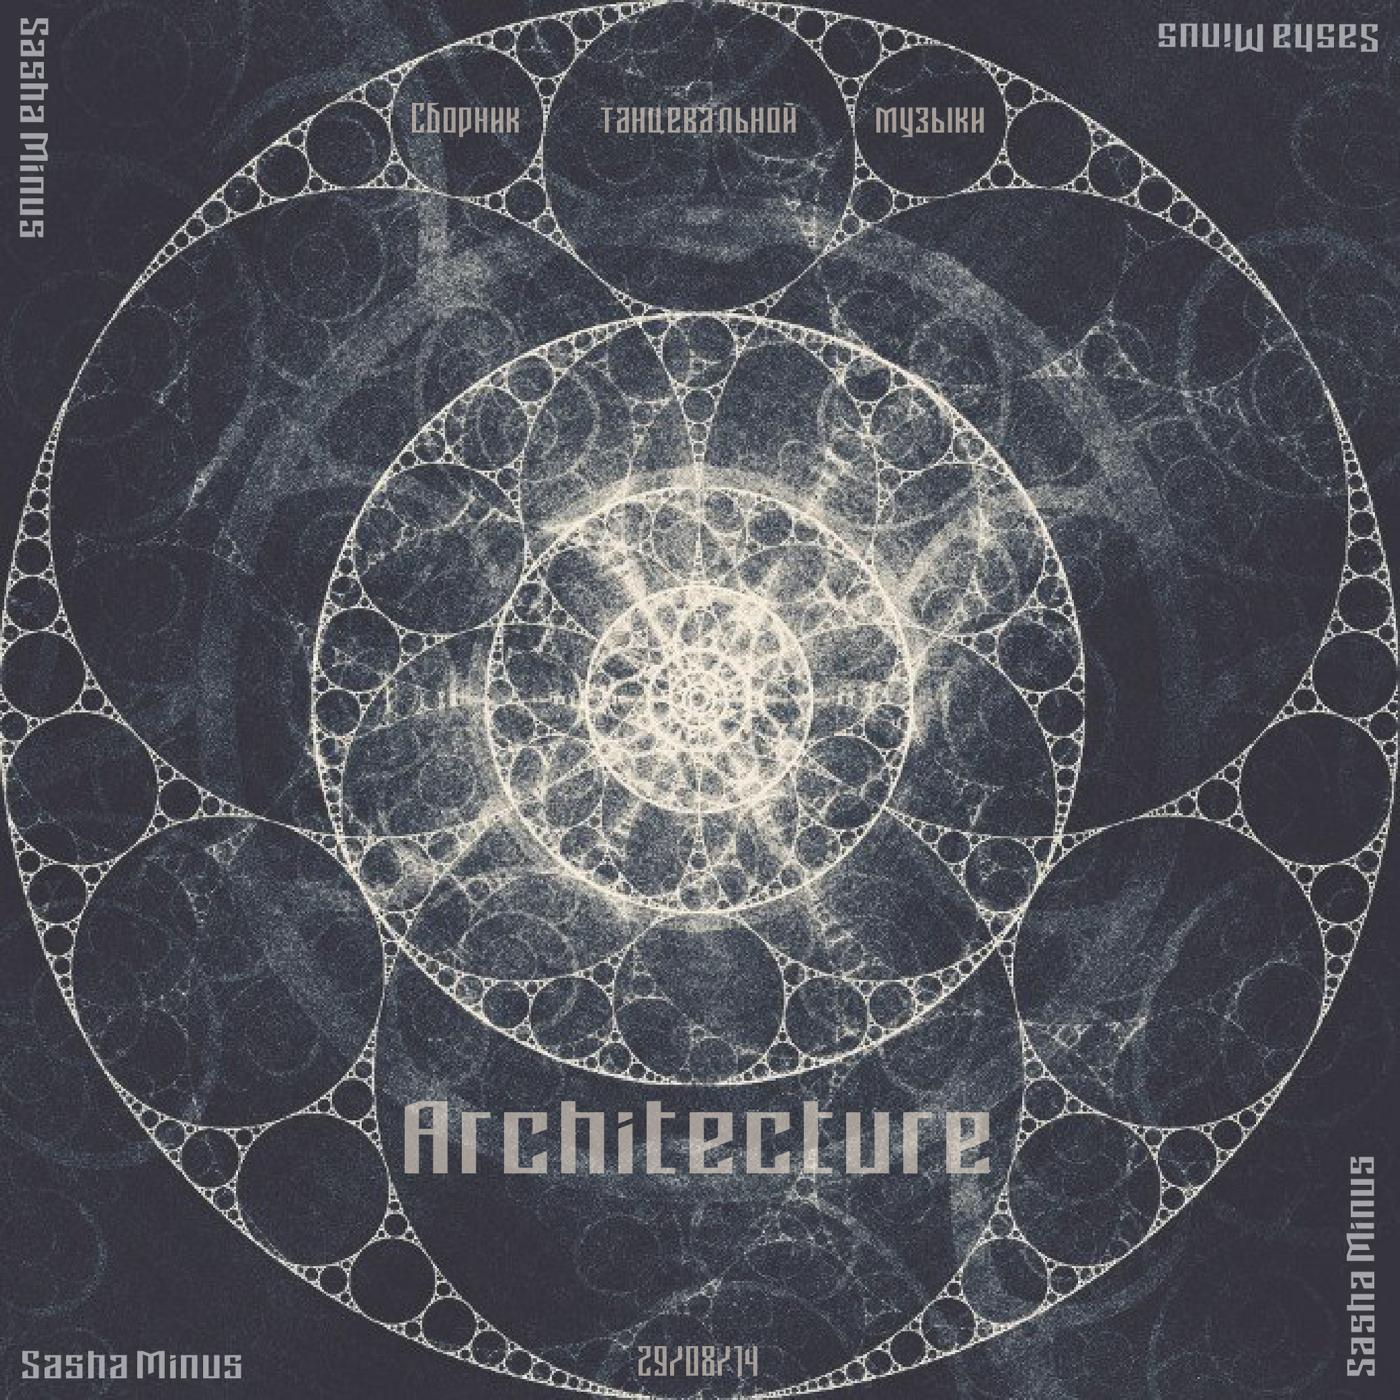 Sasha Minus - Architecture (29/08/14)